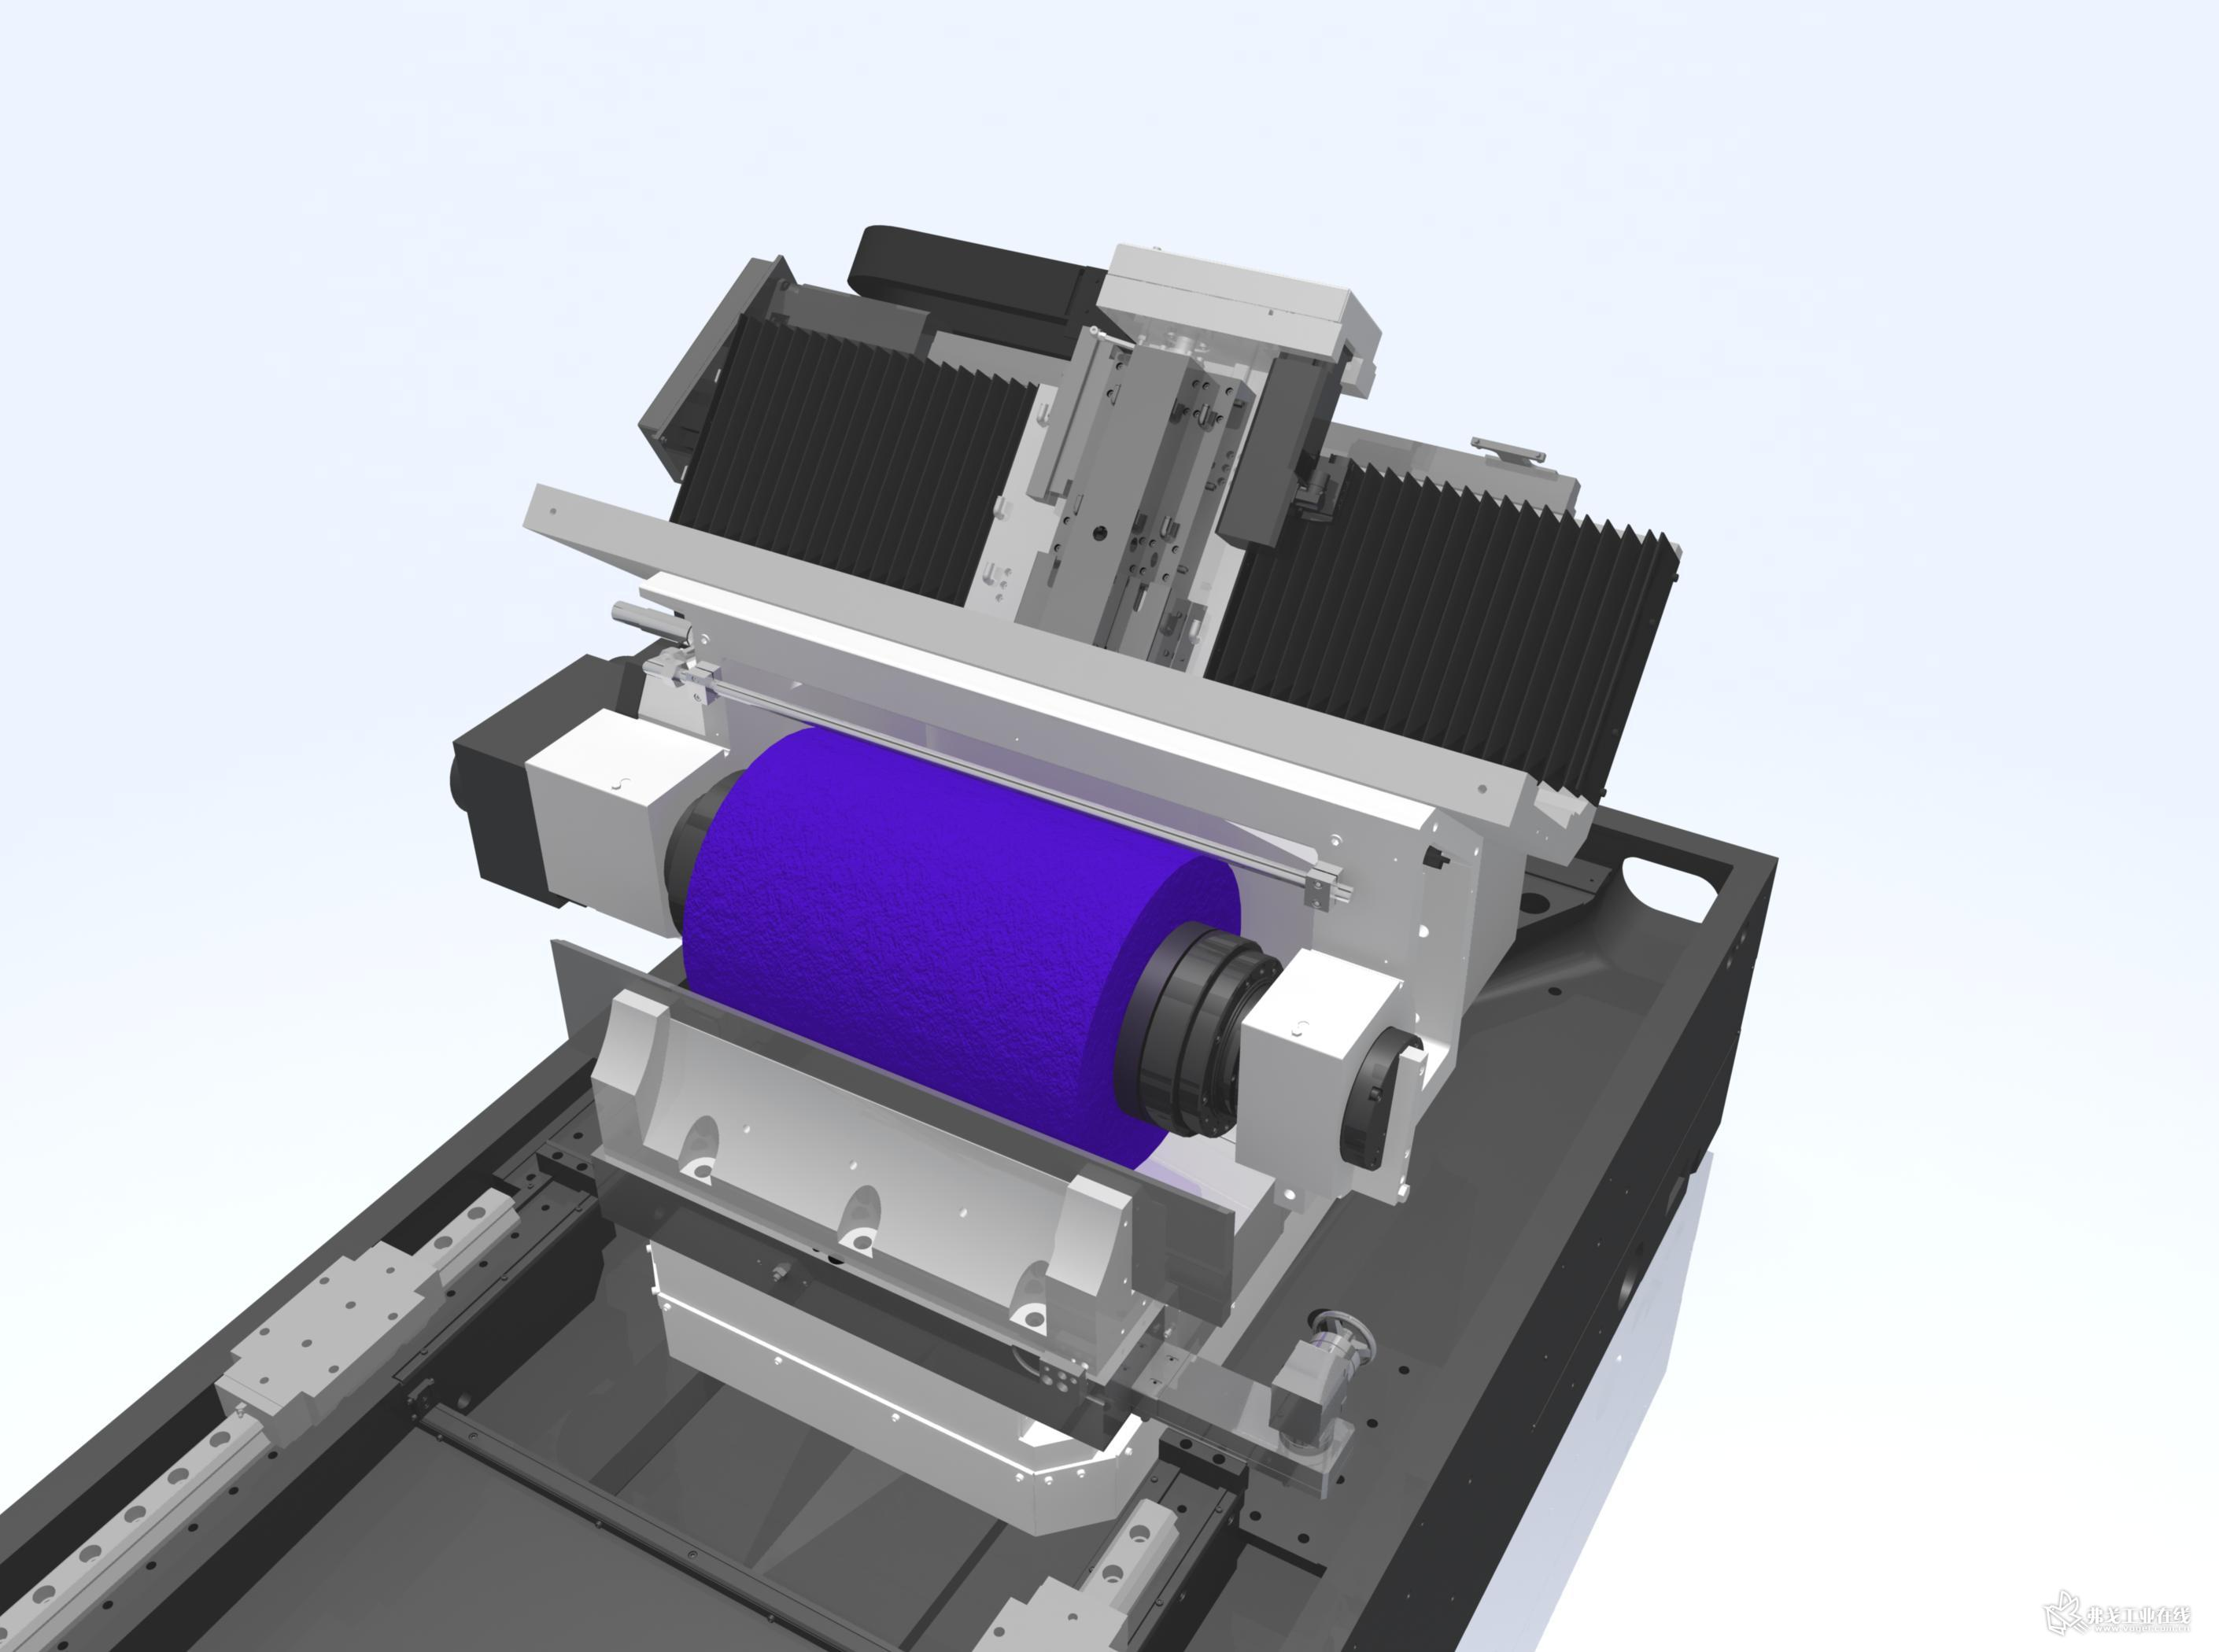 L 550 无心磨床: 工件最大加工长度为545 mm。此前,只有KRONOS L660能够加工约400 mm至480 mm长的中型零件,然而,组件的砂轮最大宽度却过大。, Otto 解释道。另一方面, KRONOS L 550 配有理想的砂轮宽度和功率为40 kW的小电机. 这是整个成本中最显著的优势。 此外,该机床的设计是基于大机床的技术质量。它的GRANITAN 床身是极其稳定和防震,从而确保了机床的磨削精度。由伺服驱动,通过预拉伸和消除反向间隙的滚珠丝杠,实现两个滑板的进给。全闭环反馈系统